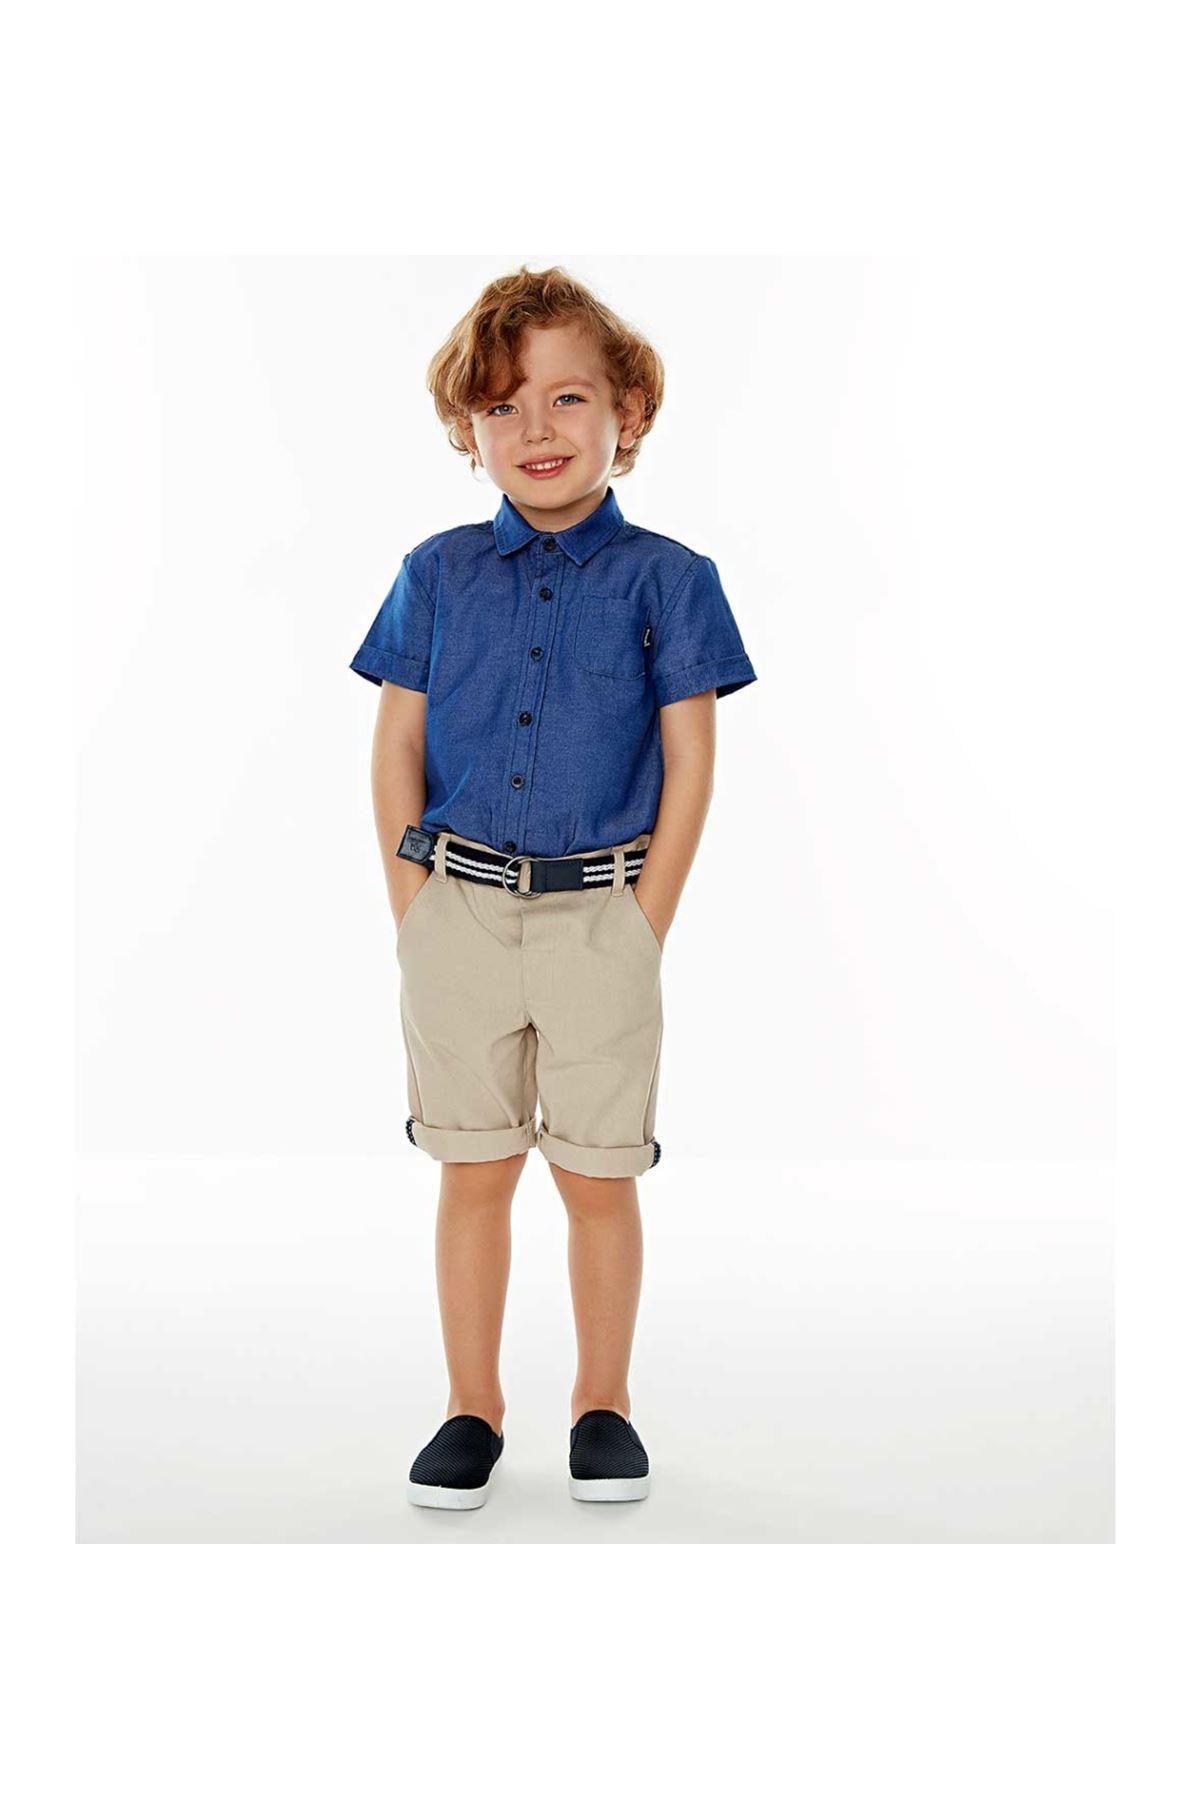 Wonder Kids Male Child Shorts 010-7268-028